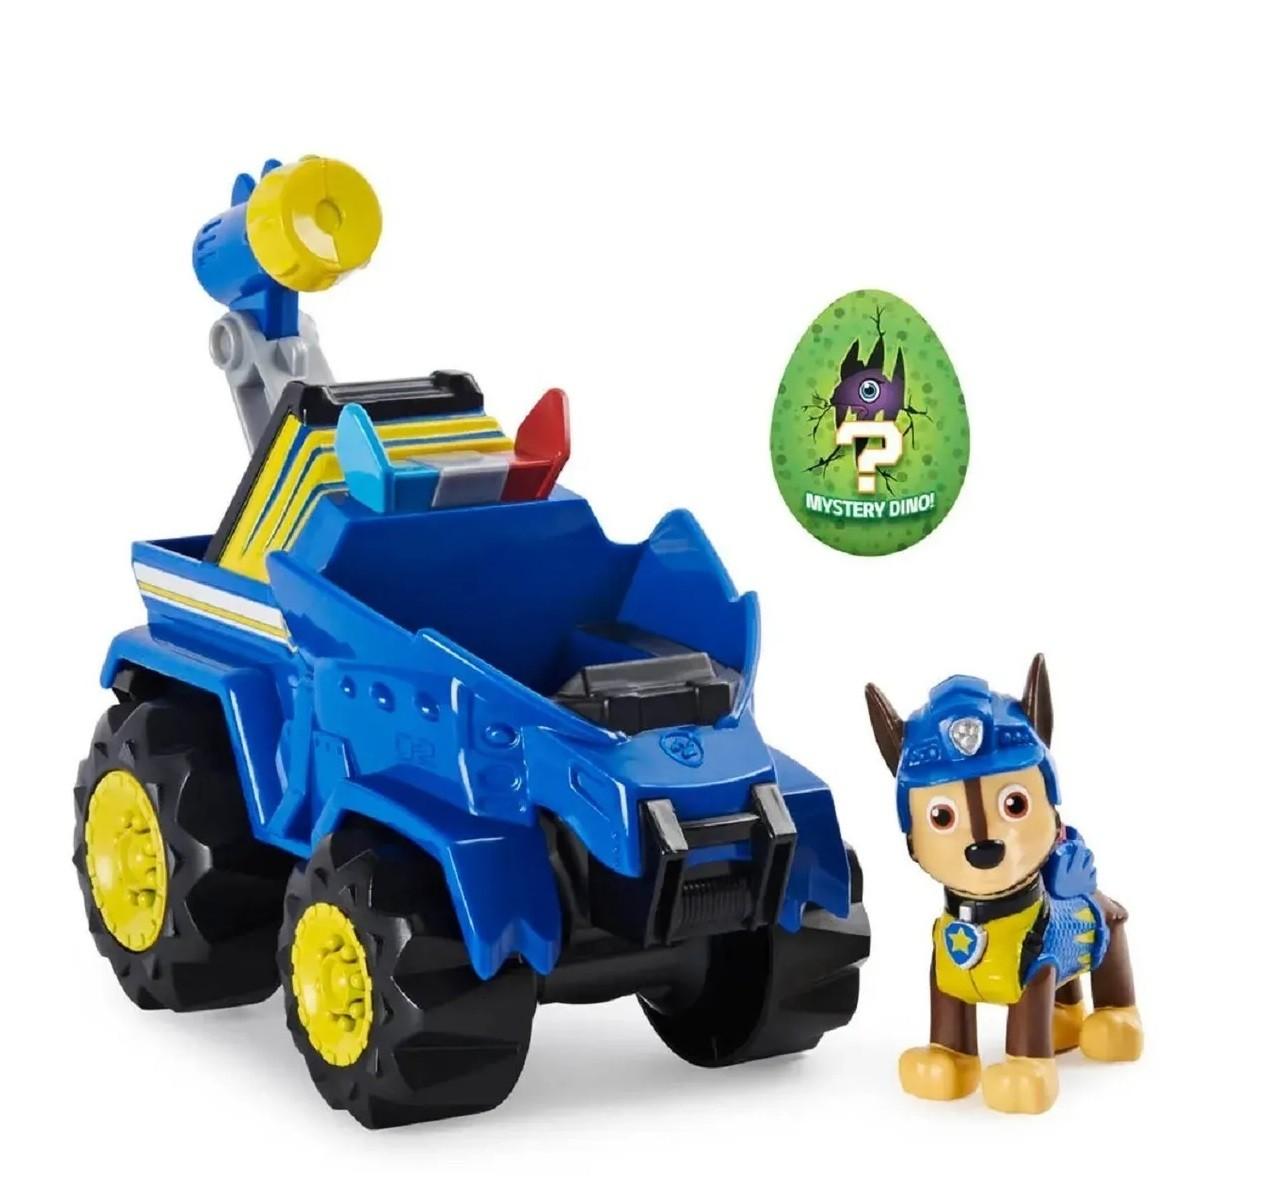 Carrinho e Boneco Dino Rescue Carro Temático Patrulha Canina Chase - Sunny